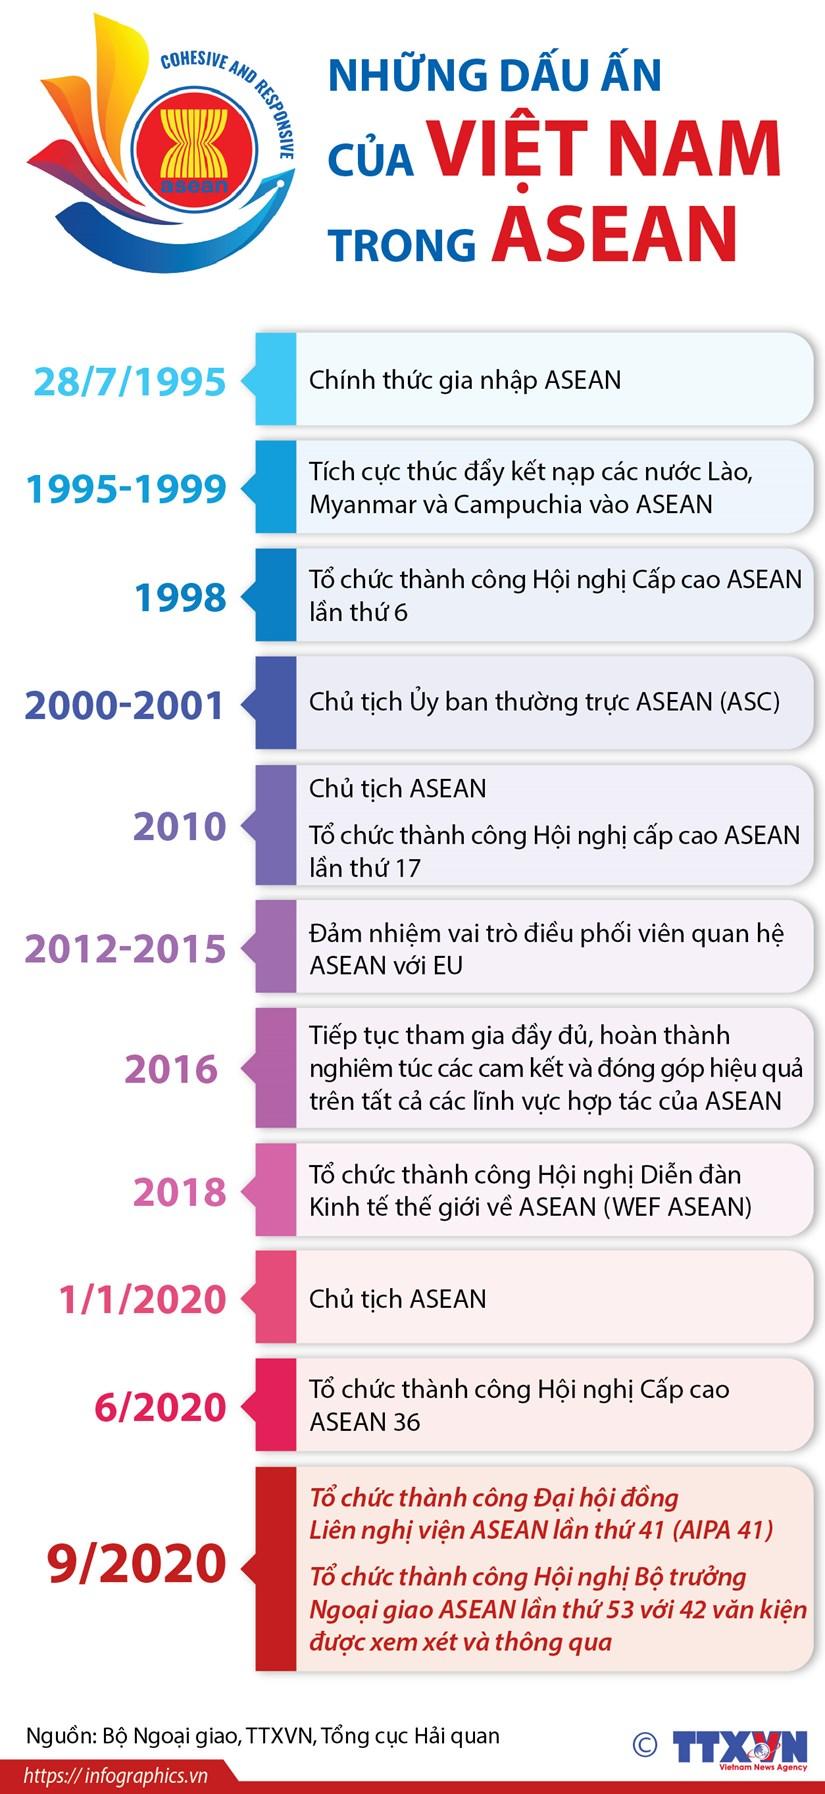 [Infographics] Nhung dau an cua Viet Nam trong ASEAN hinh anh 1